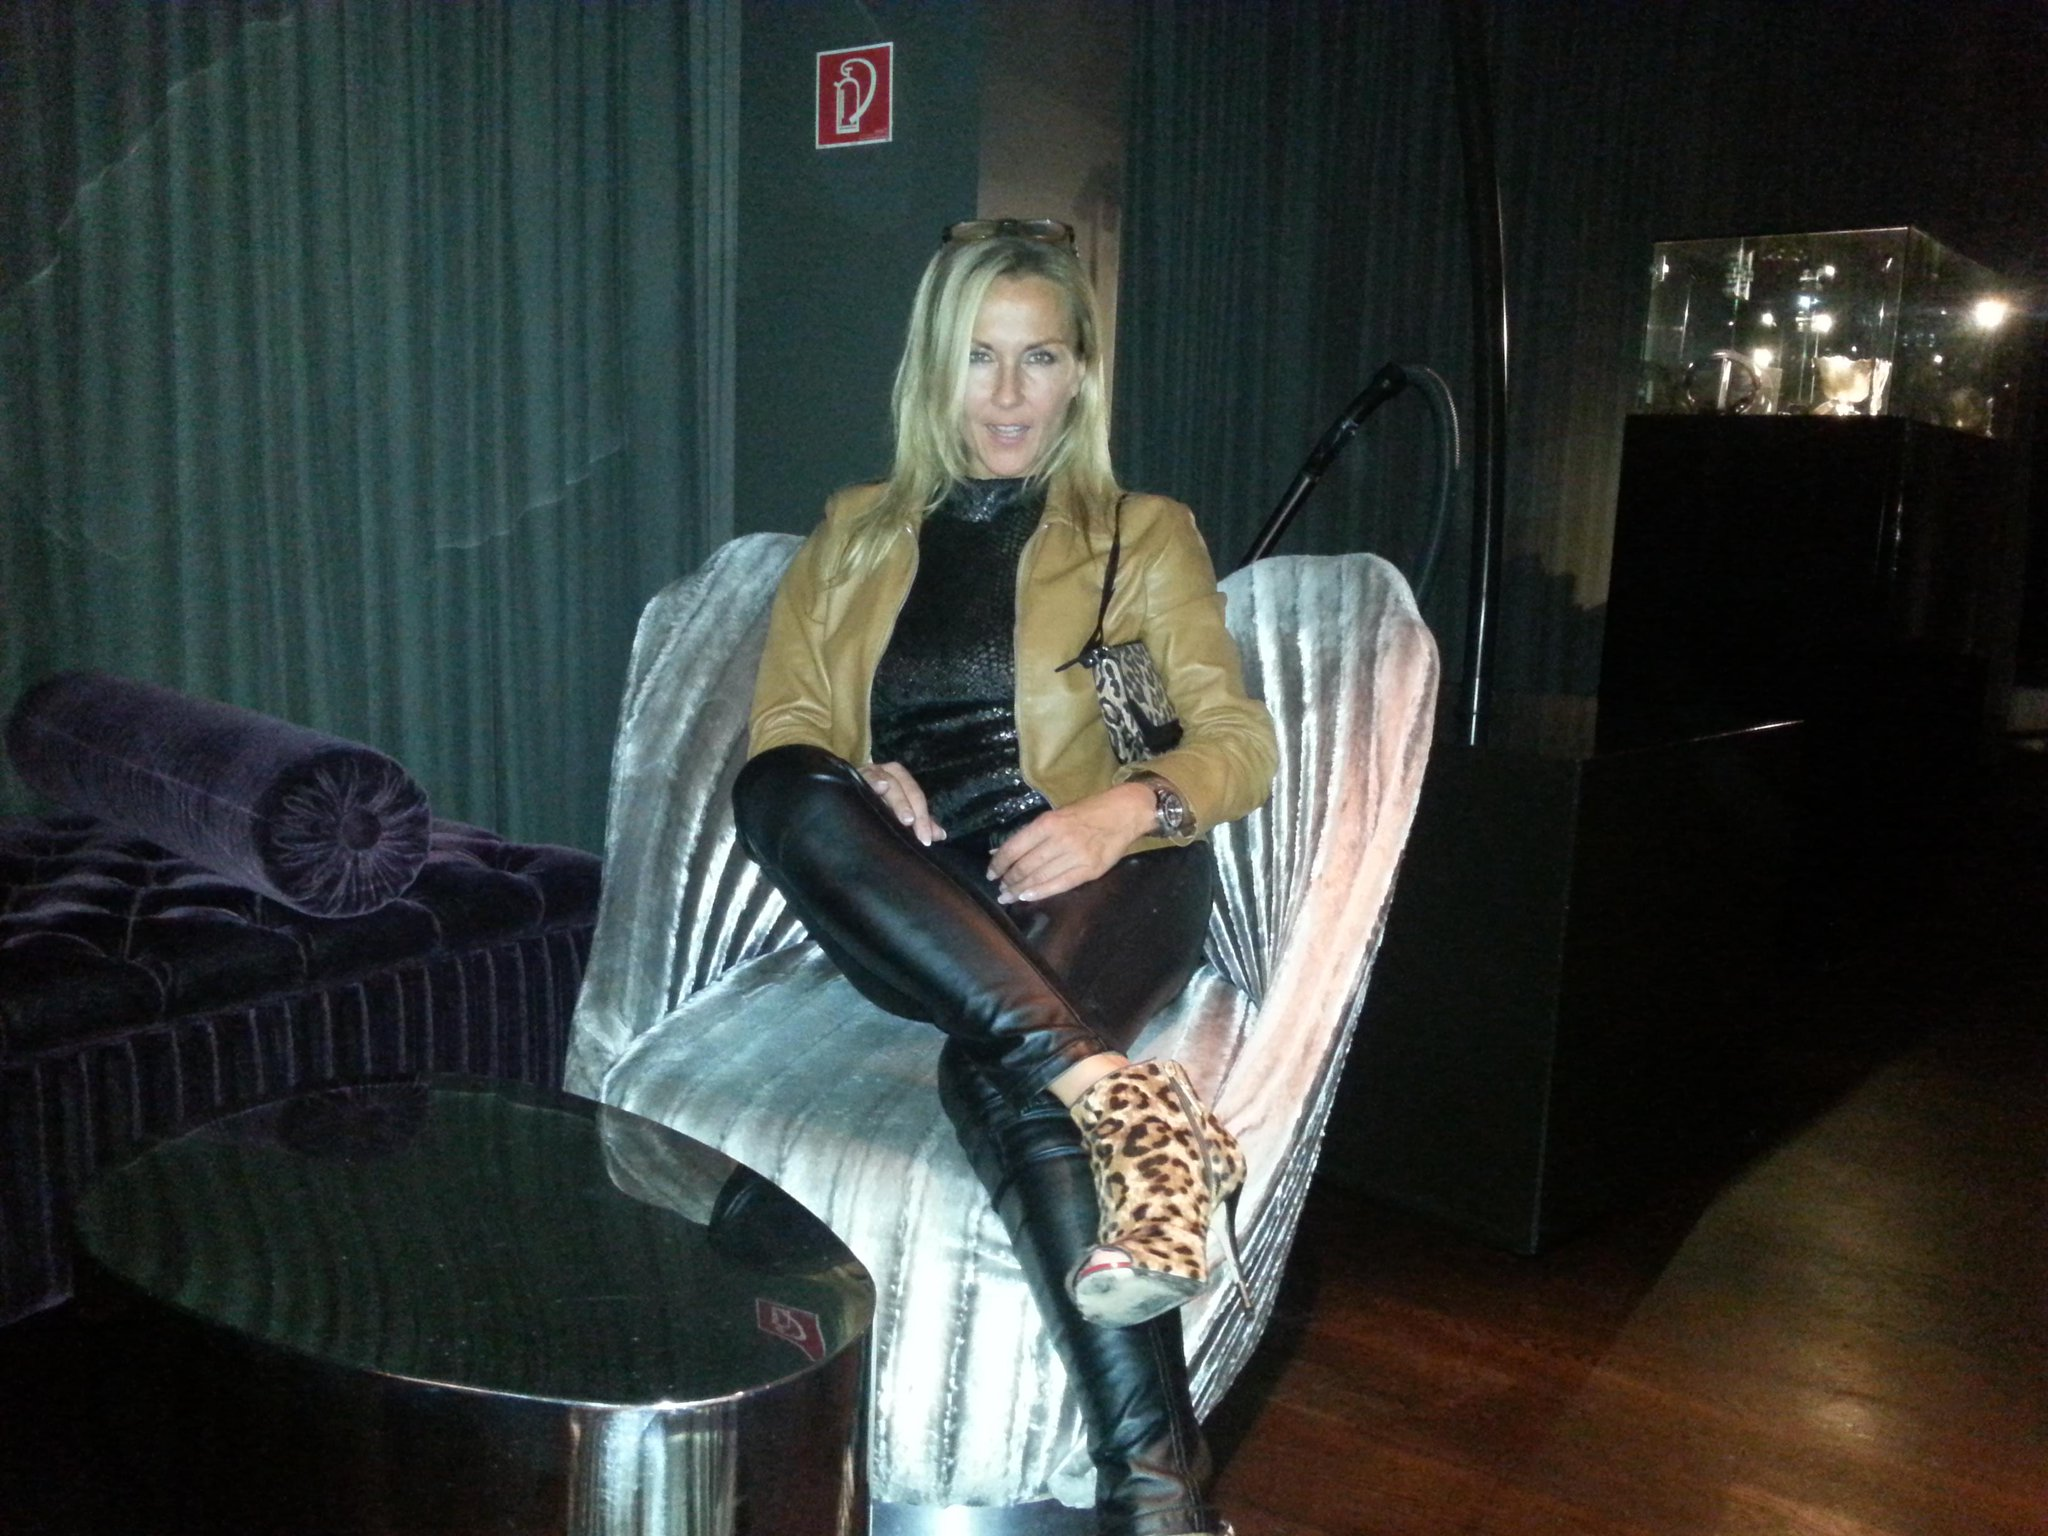 Comtesse-monique My Celebrity: